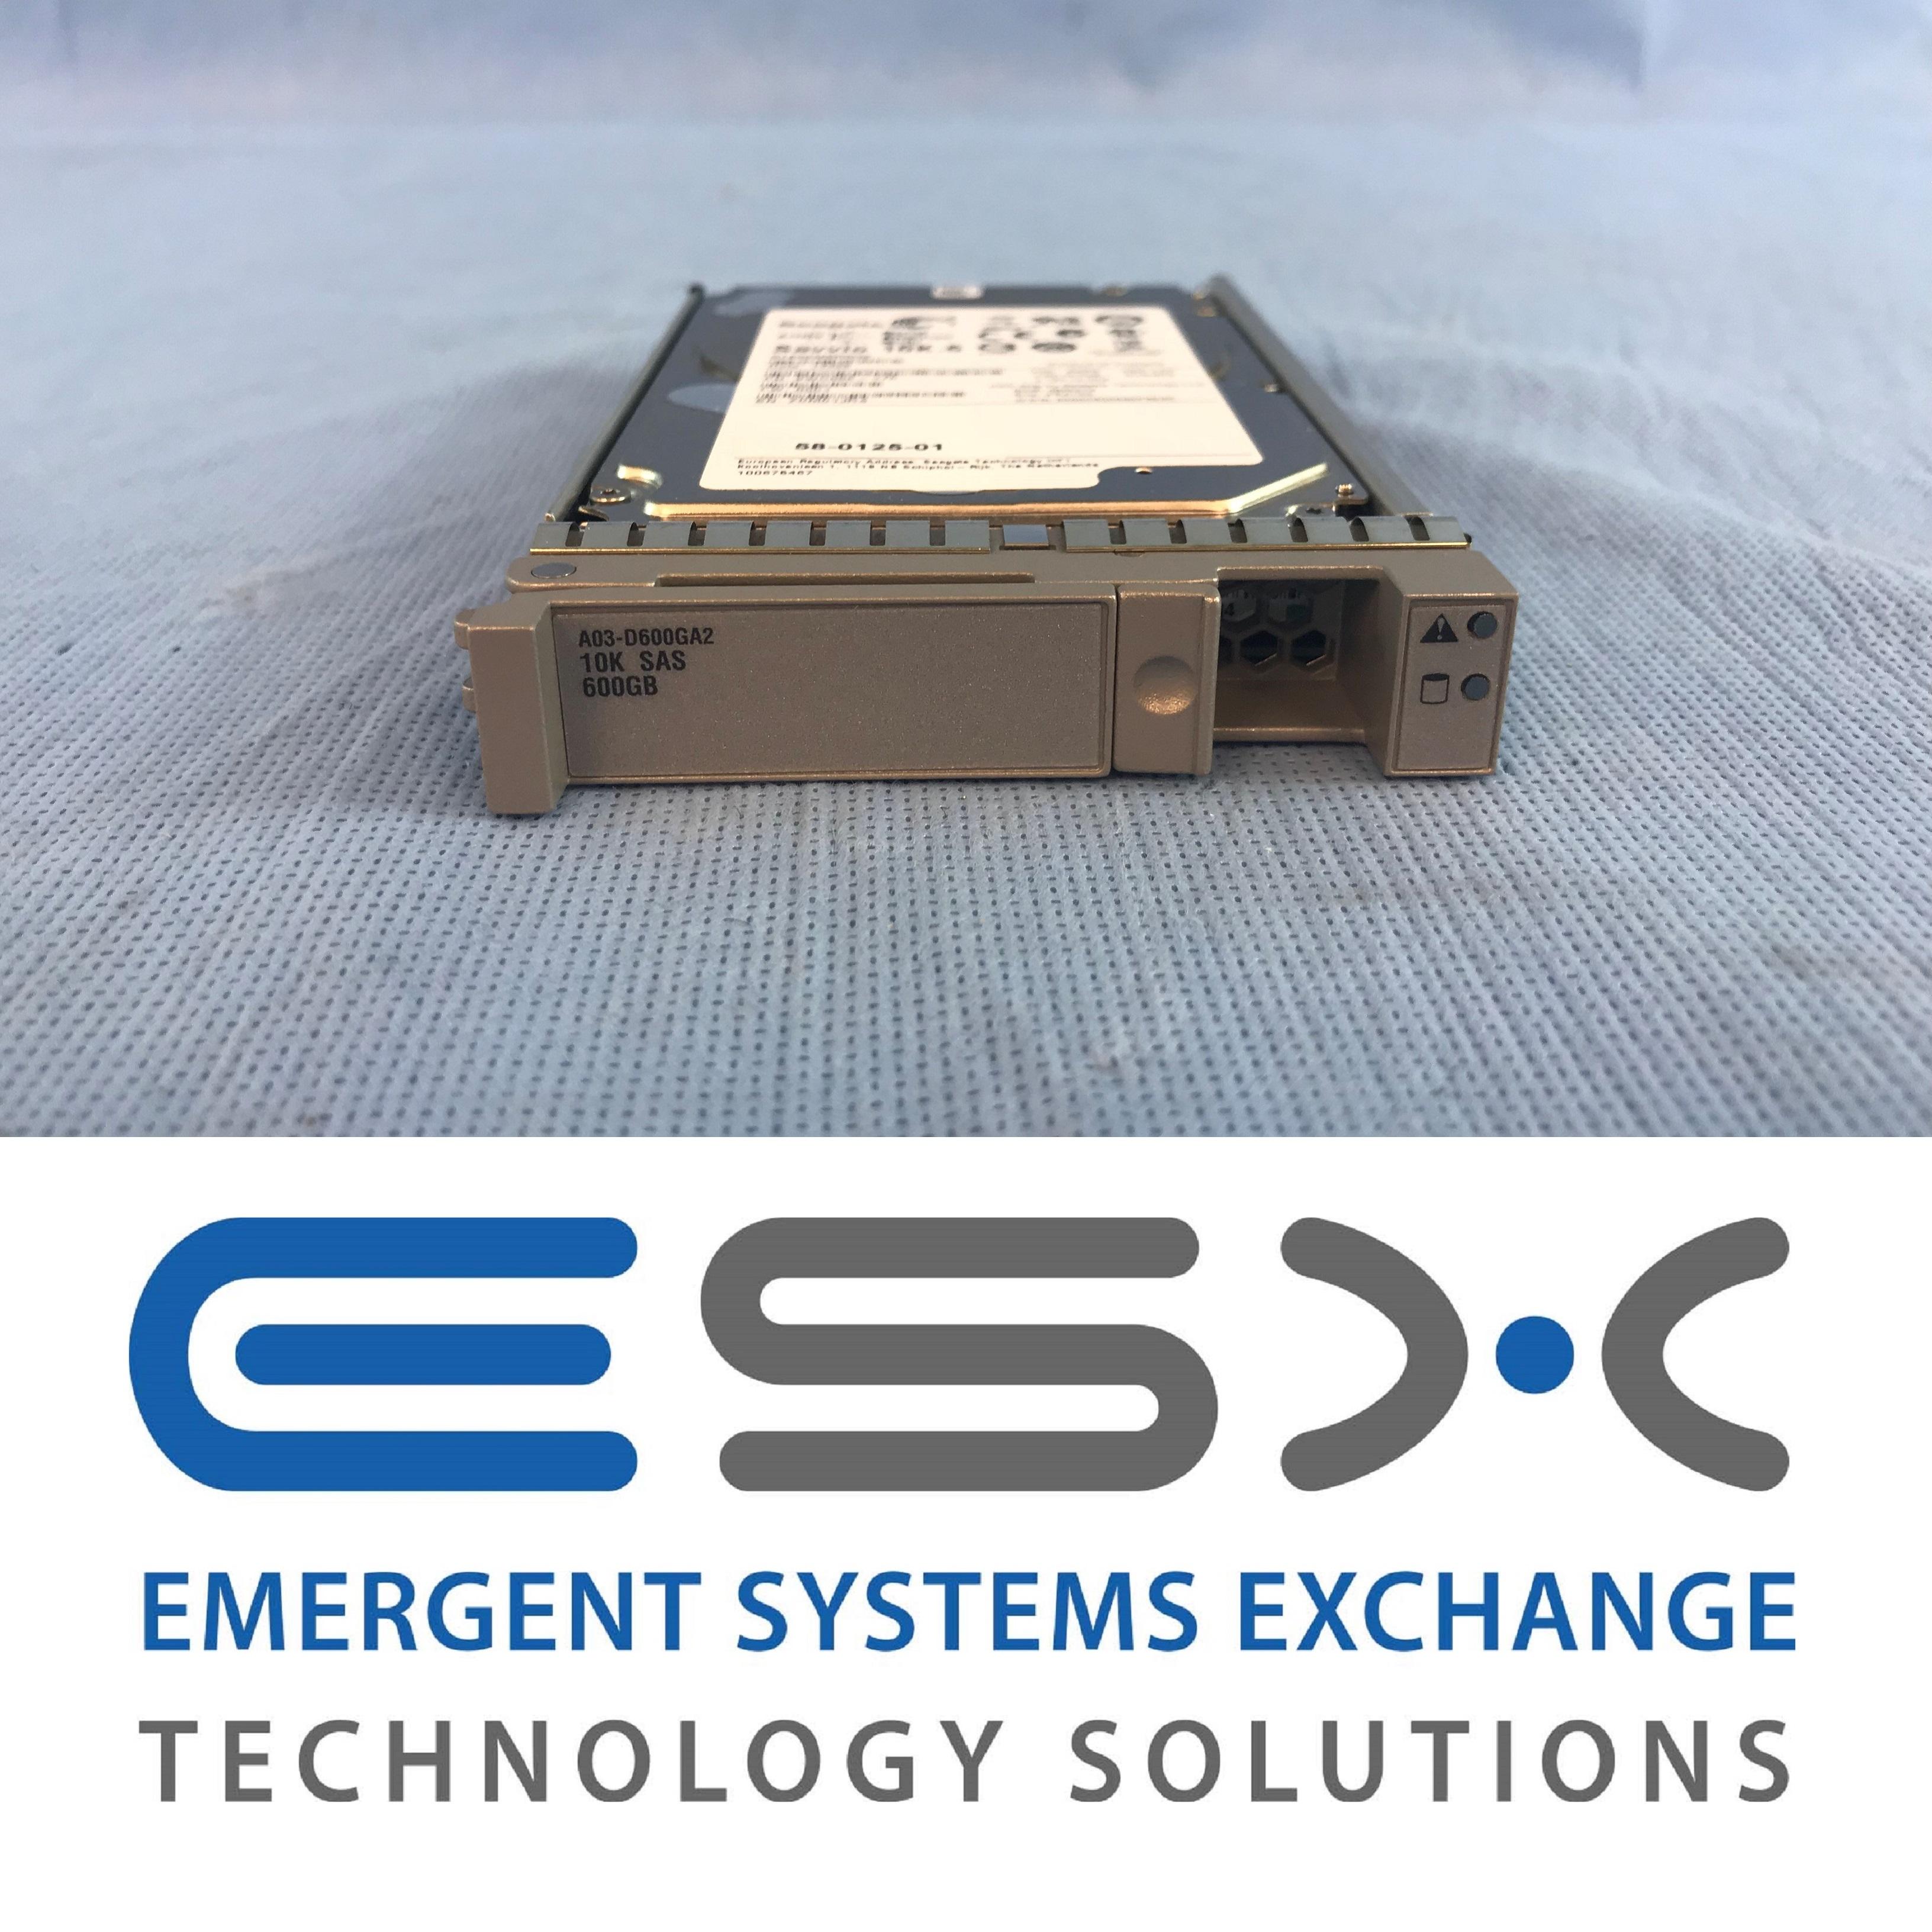 A03-D600GA2 Cisco UCS 600GB 10K 6Gbps SAS 2.5/'/' Hard Drive